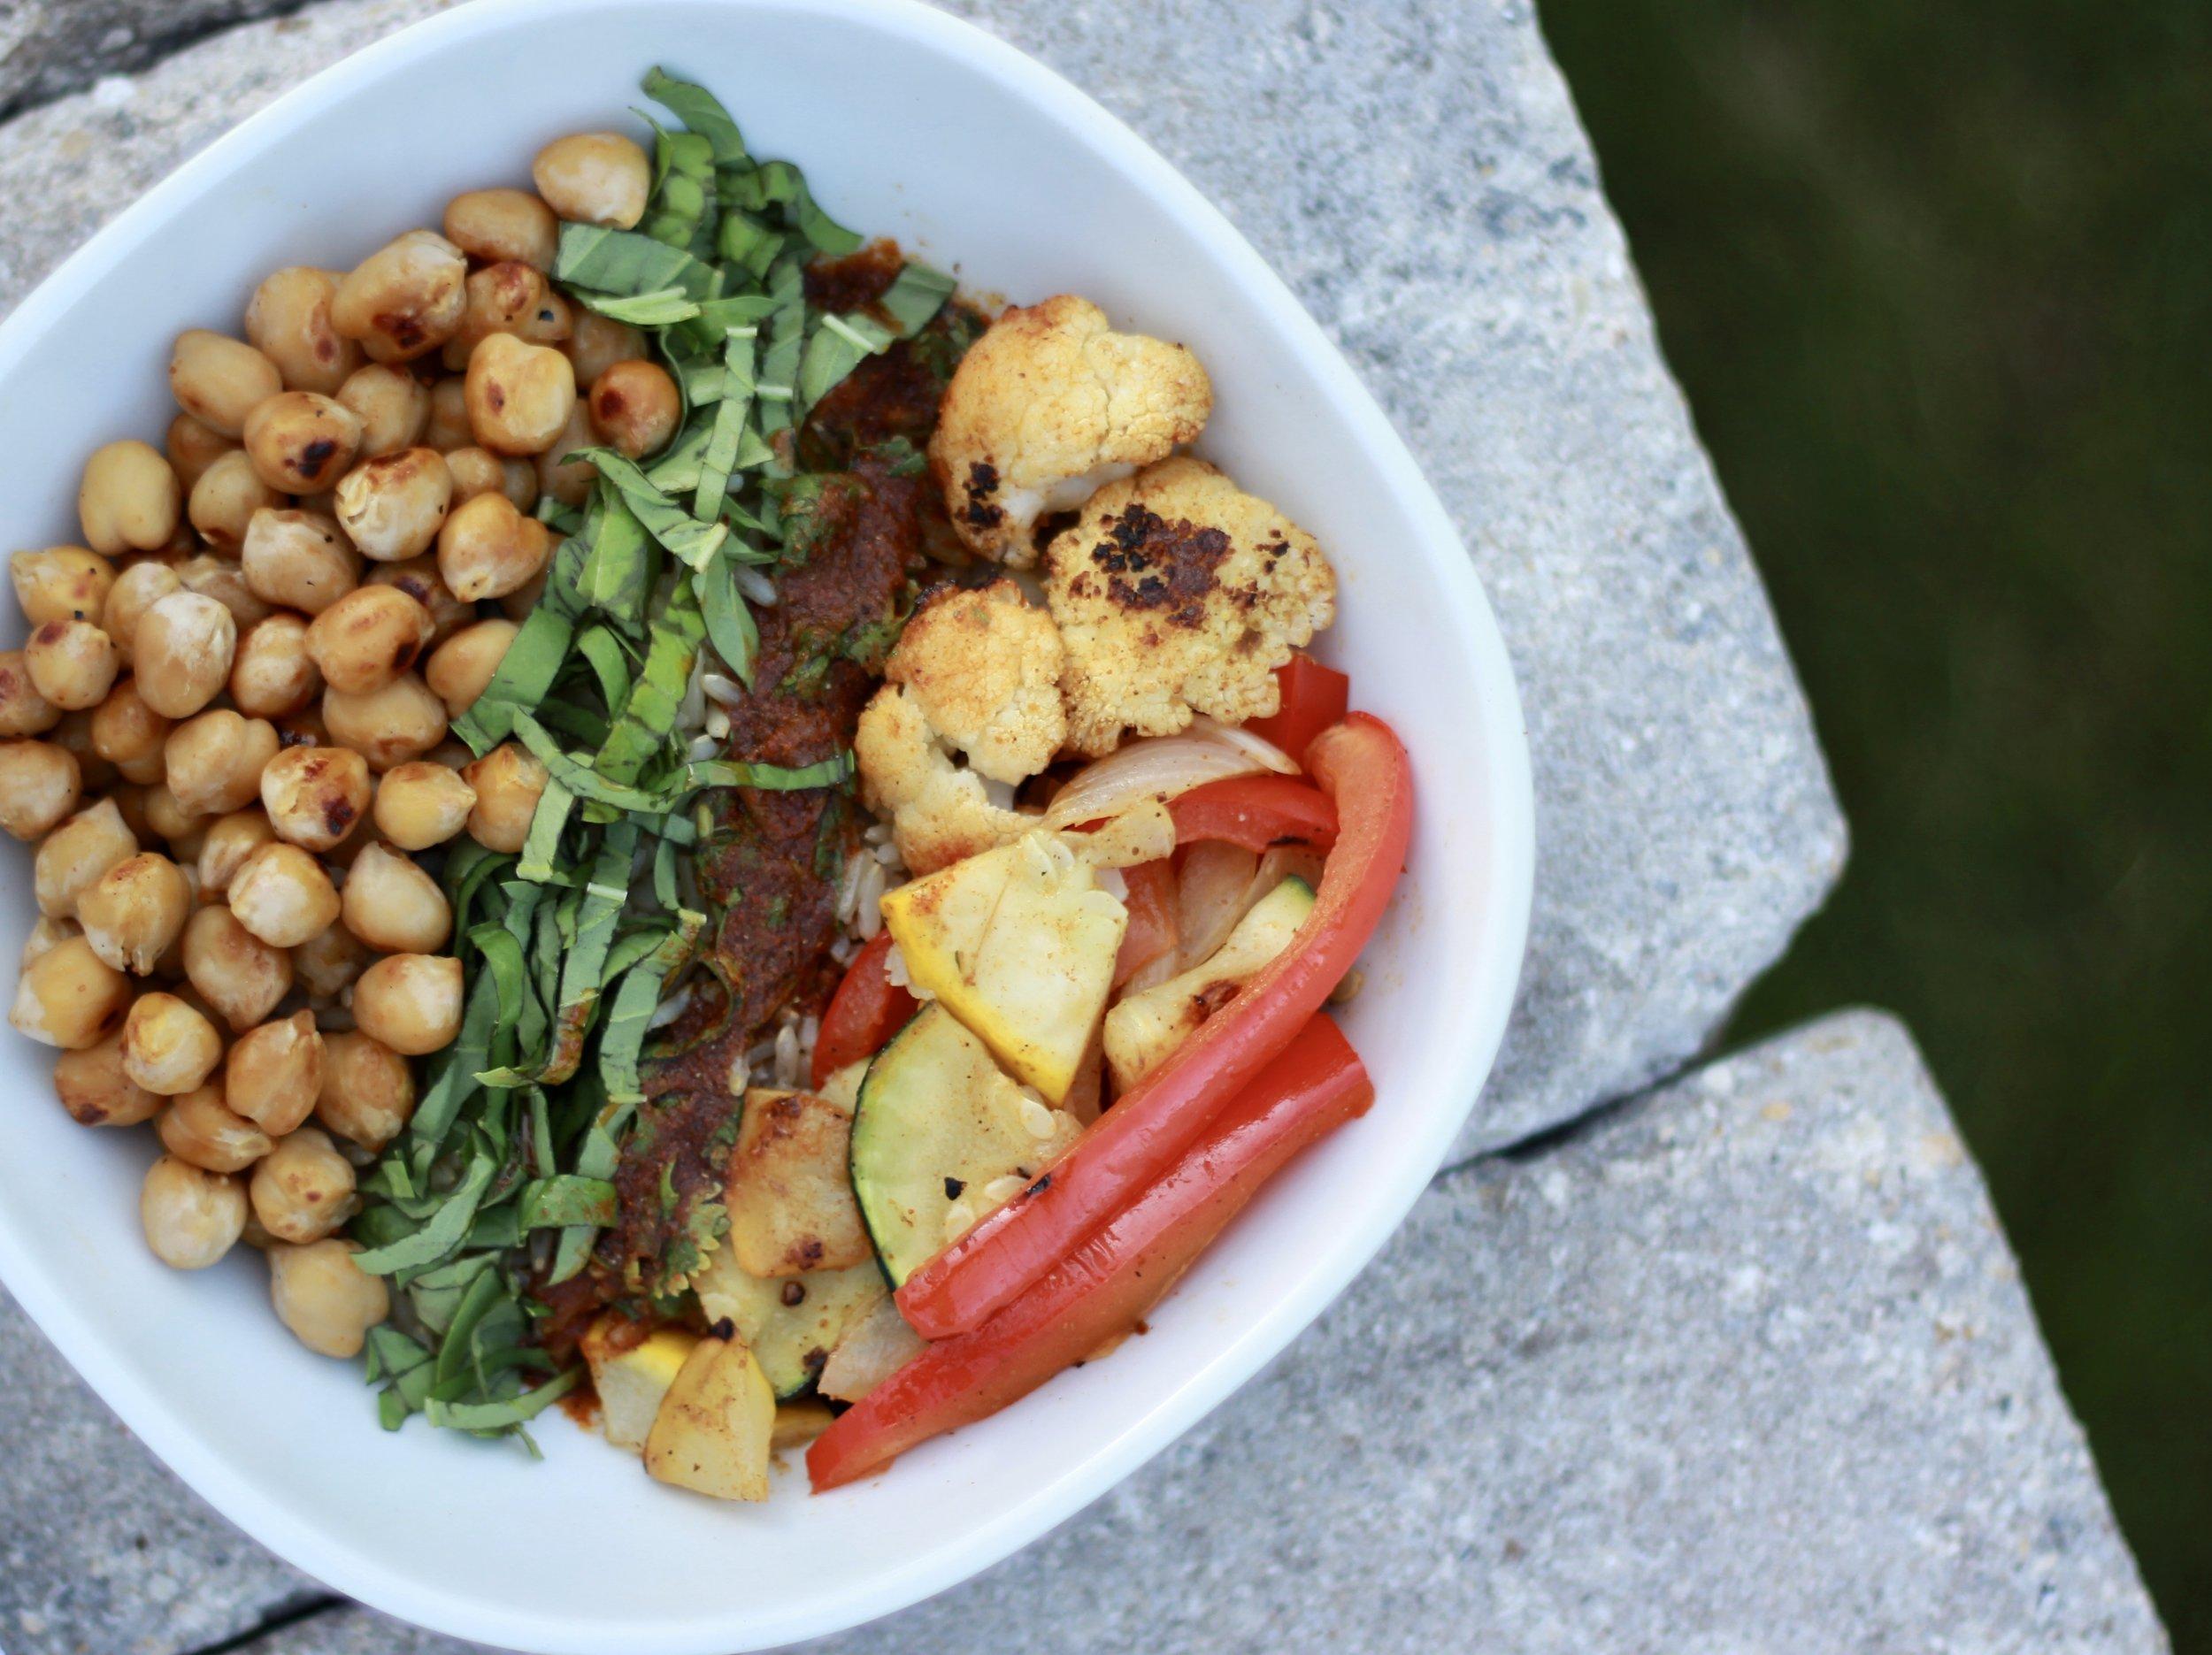 Roasted Vegetable Farro Bowls